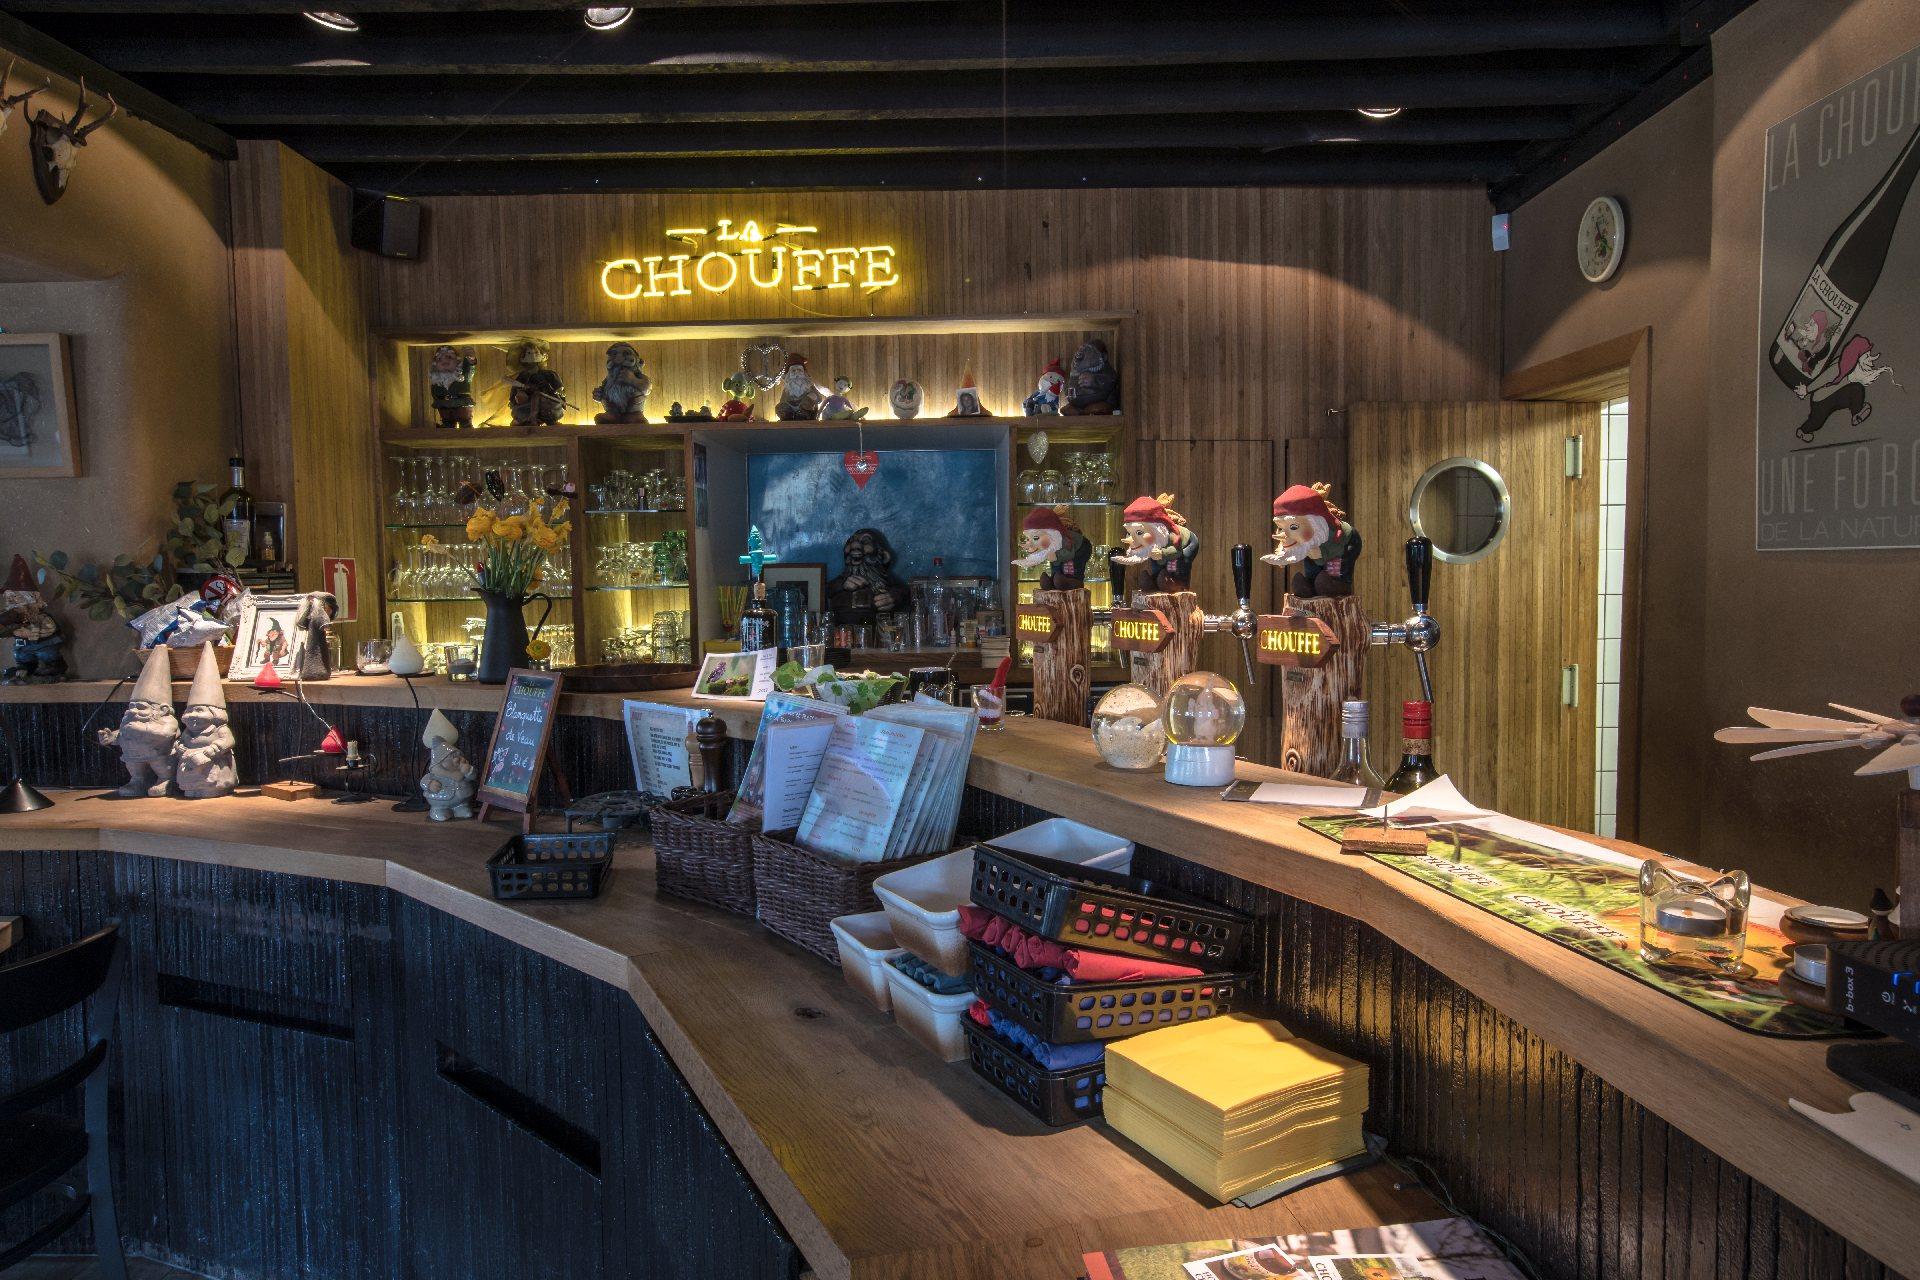 Salle de la taverne de la Brasserie d'Achouffe